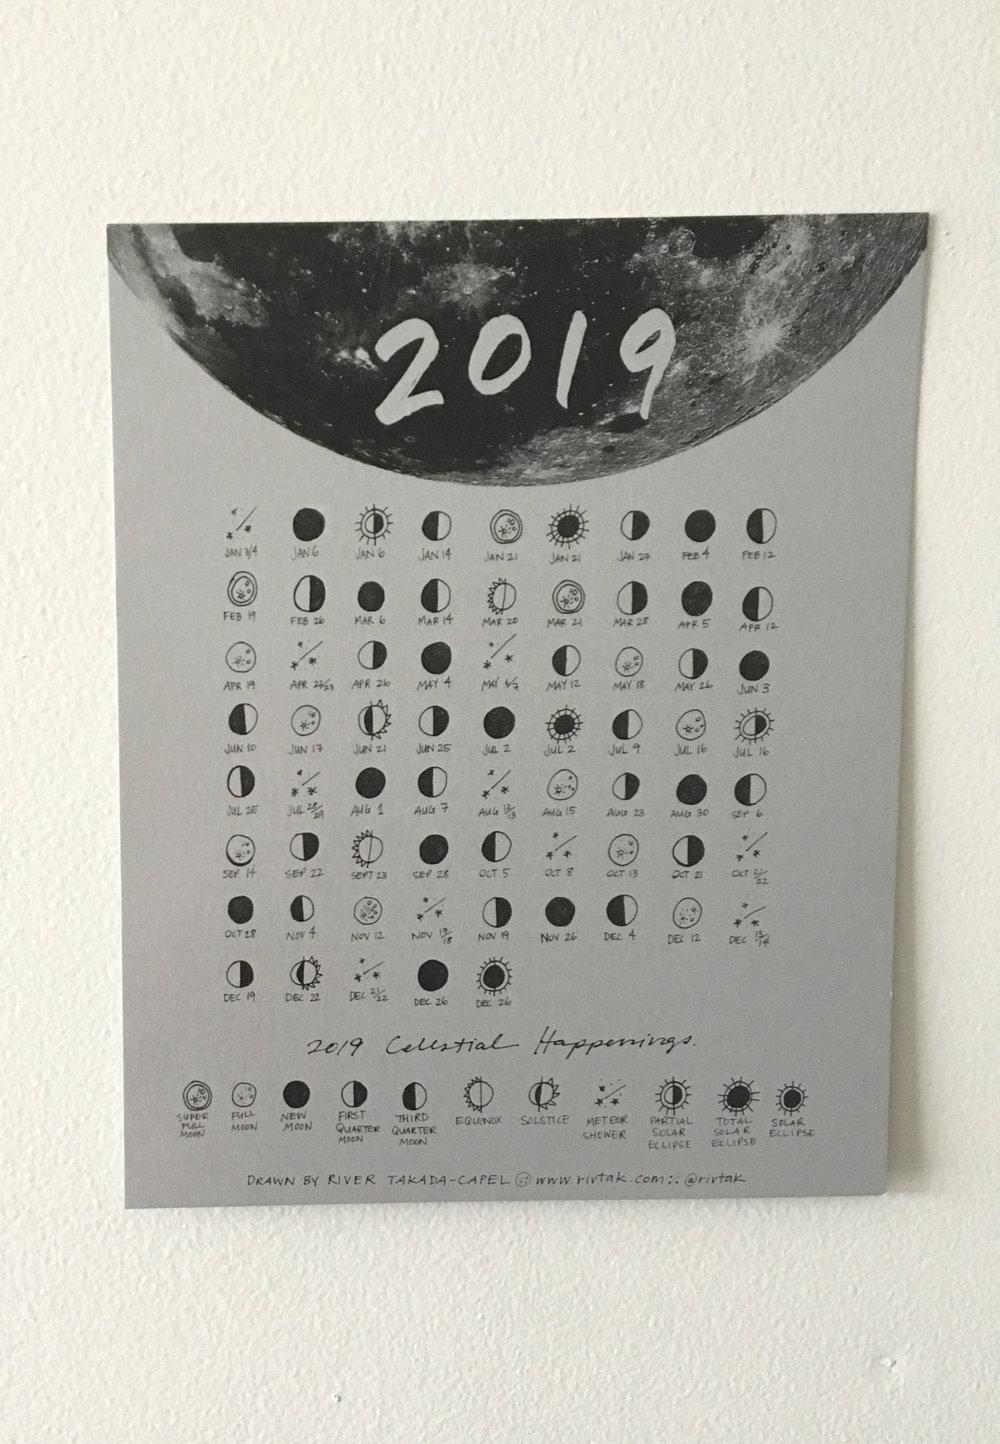 "2019 Celestial Calendar- 8 X 10"" Silver Print — Rivtak inside 8 X 10 Print Calendar"